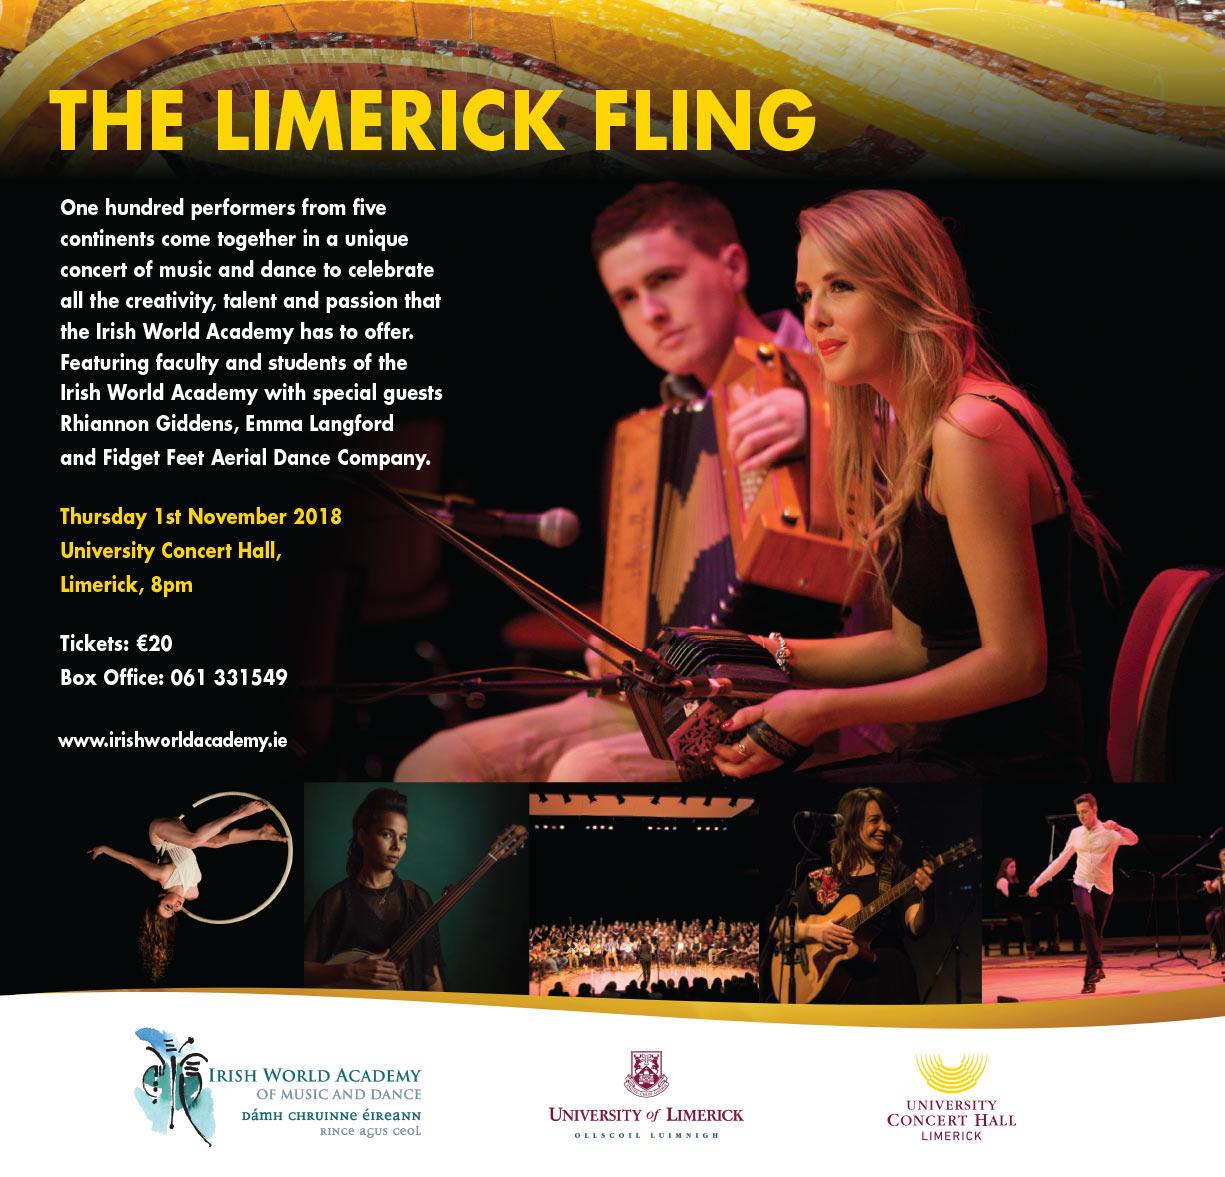 Limerick Fling 2018